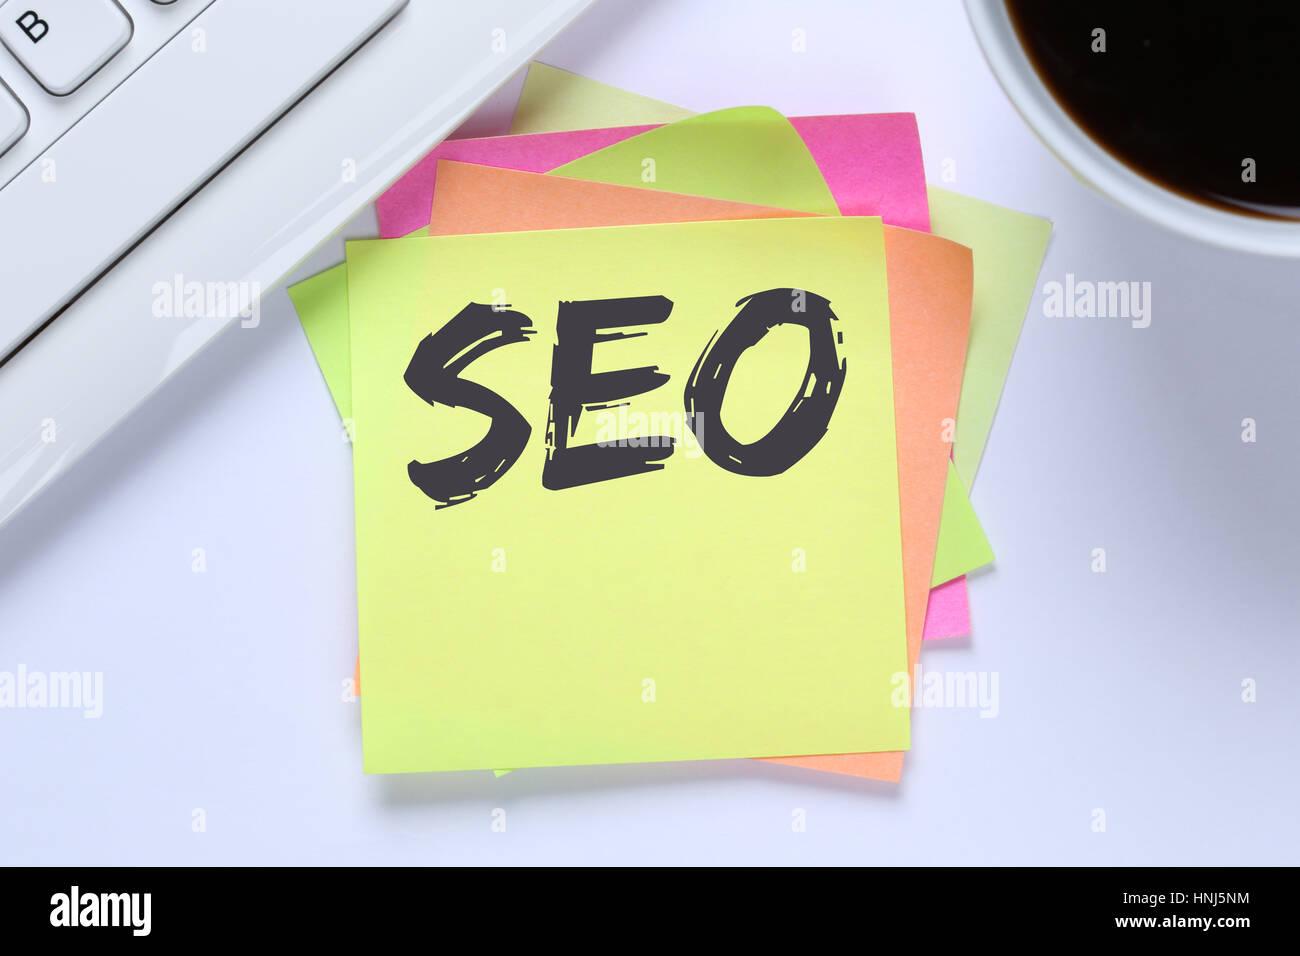 SEO Search Engine Optimization for websites internet business computer desk keyboard - Stock Image